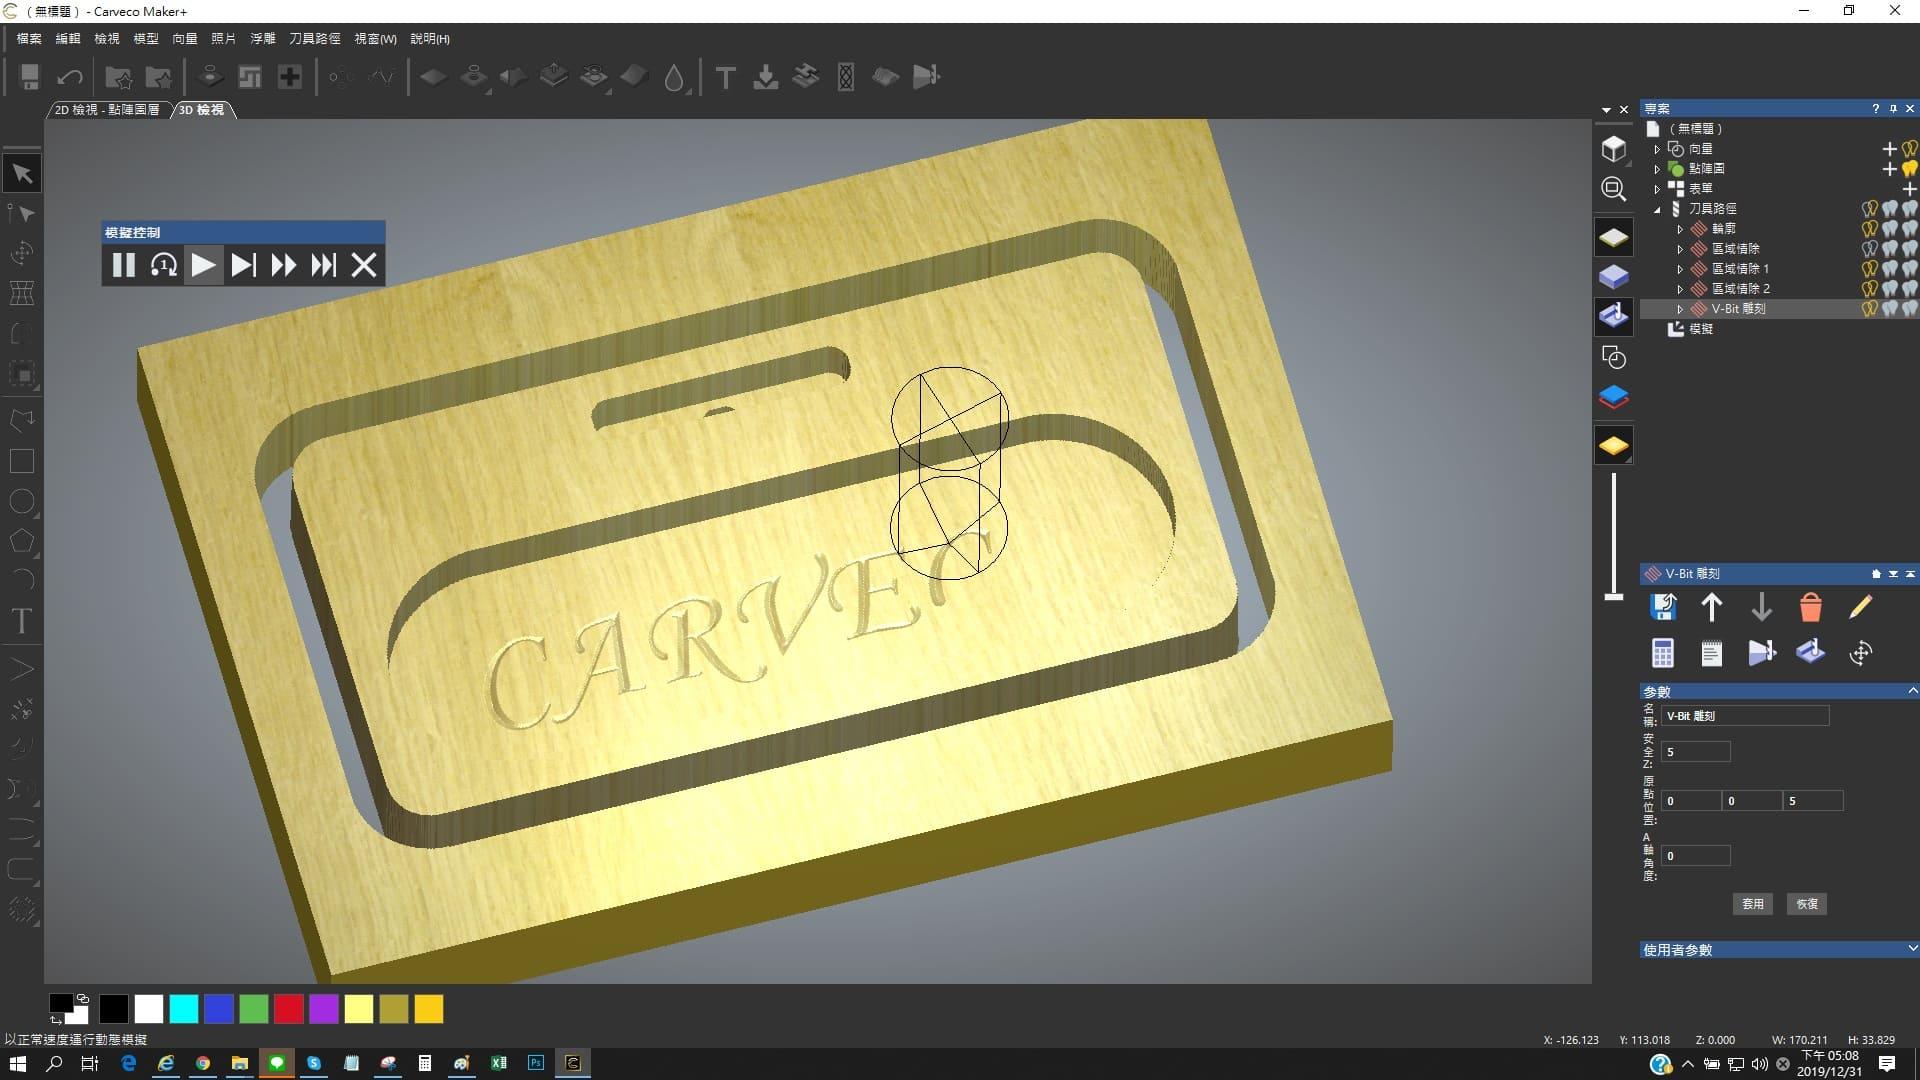 2.5D加工 - V-bit 文字雕刻 - CARVECO